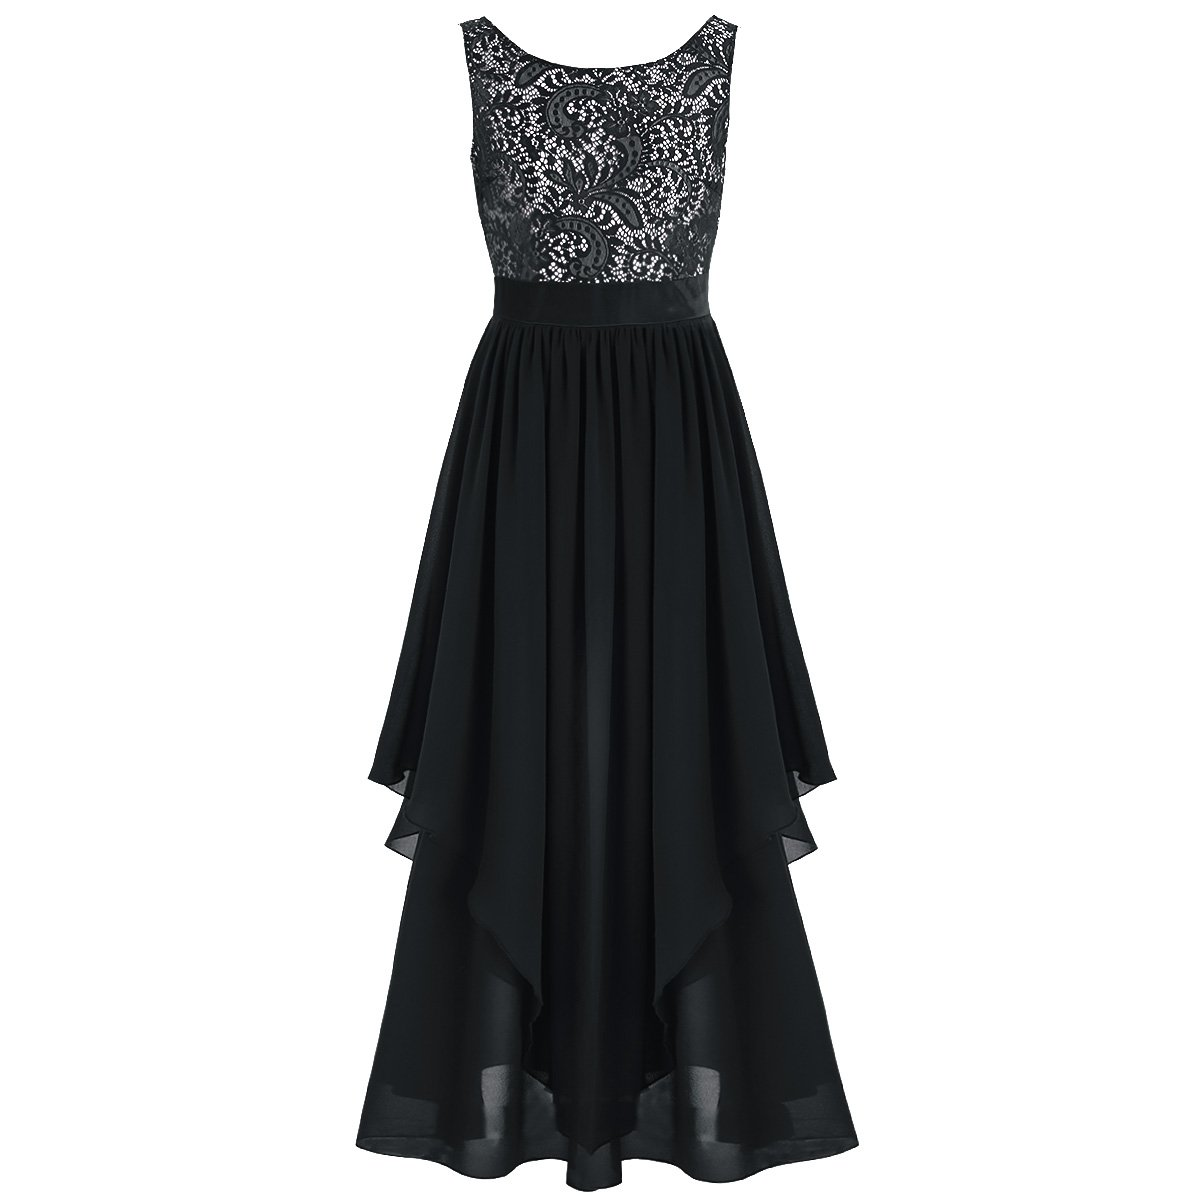 dPois Womens Elegant Sleeveless V-Back Floral Lace Maxi Long Chiffon Wedding Cocktail Formal Dress